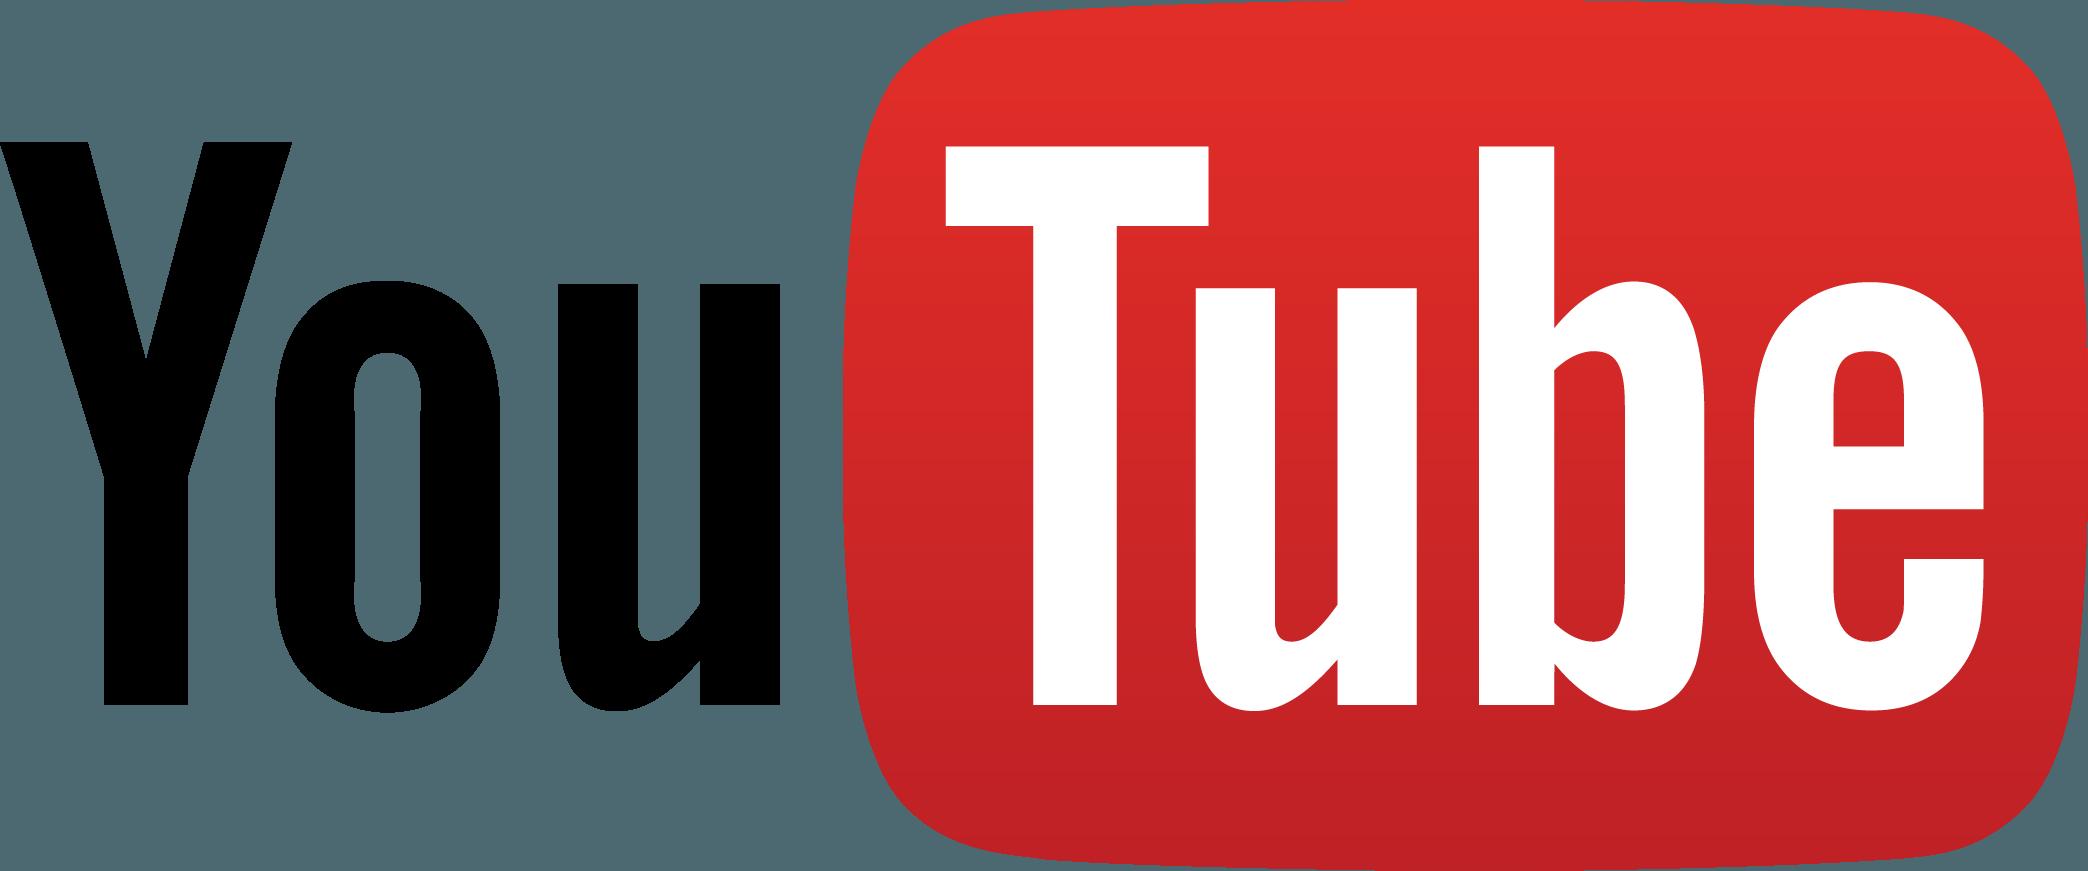 youtube logo vector eps free download logo icons clipart rh freelogovectors net YouTube Logo Vector youtube logo vector eps